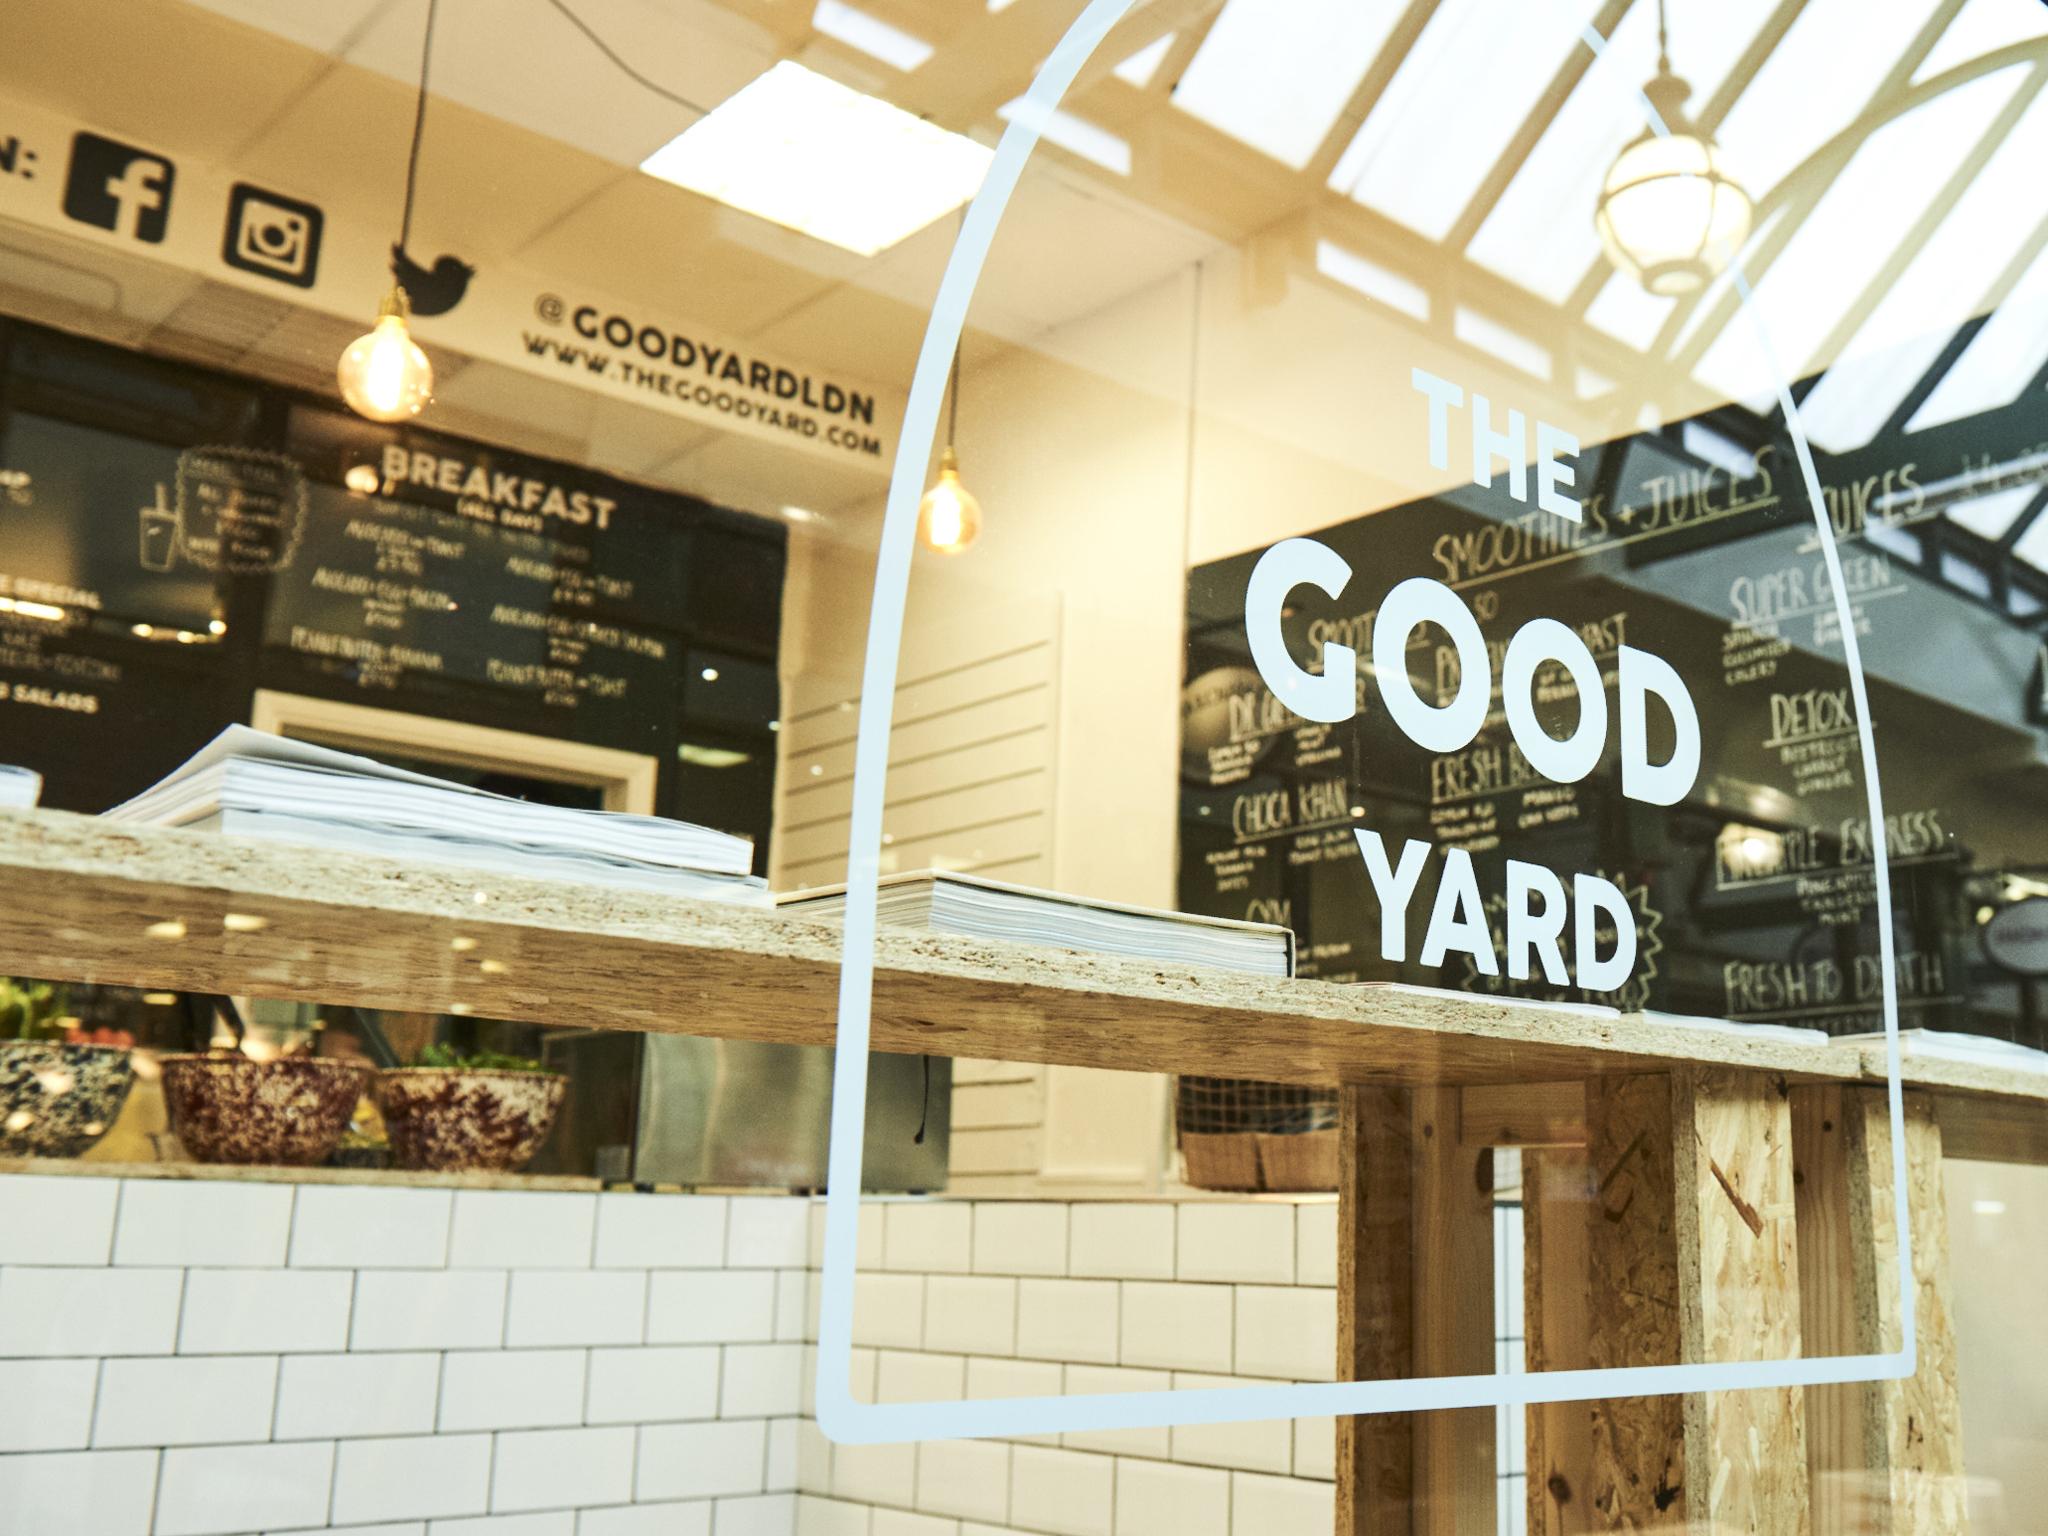 London's best juice bars, The Good Yard